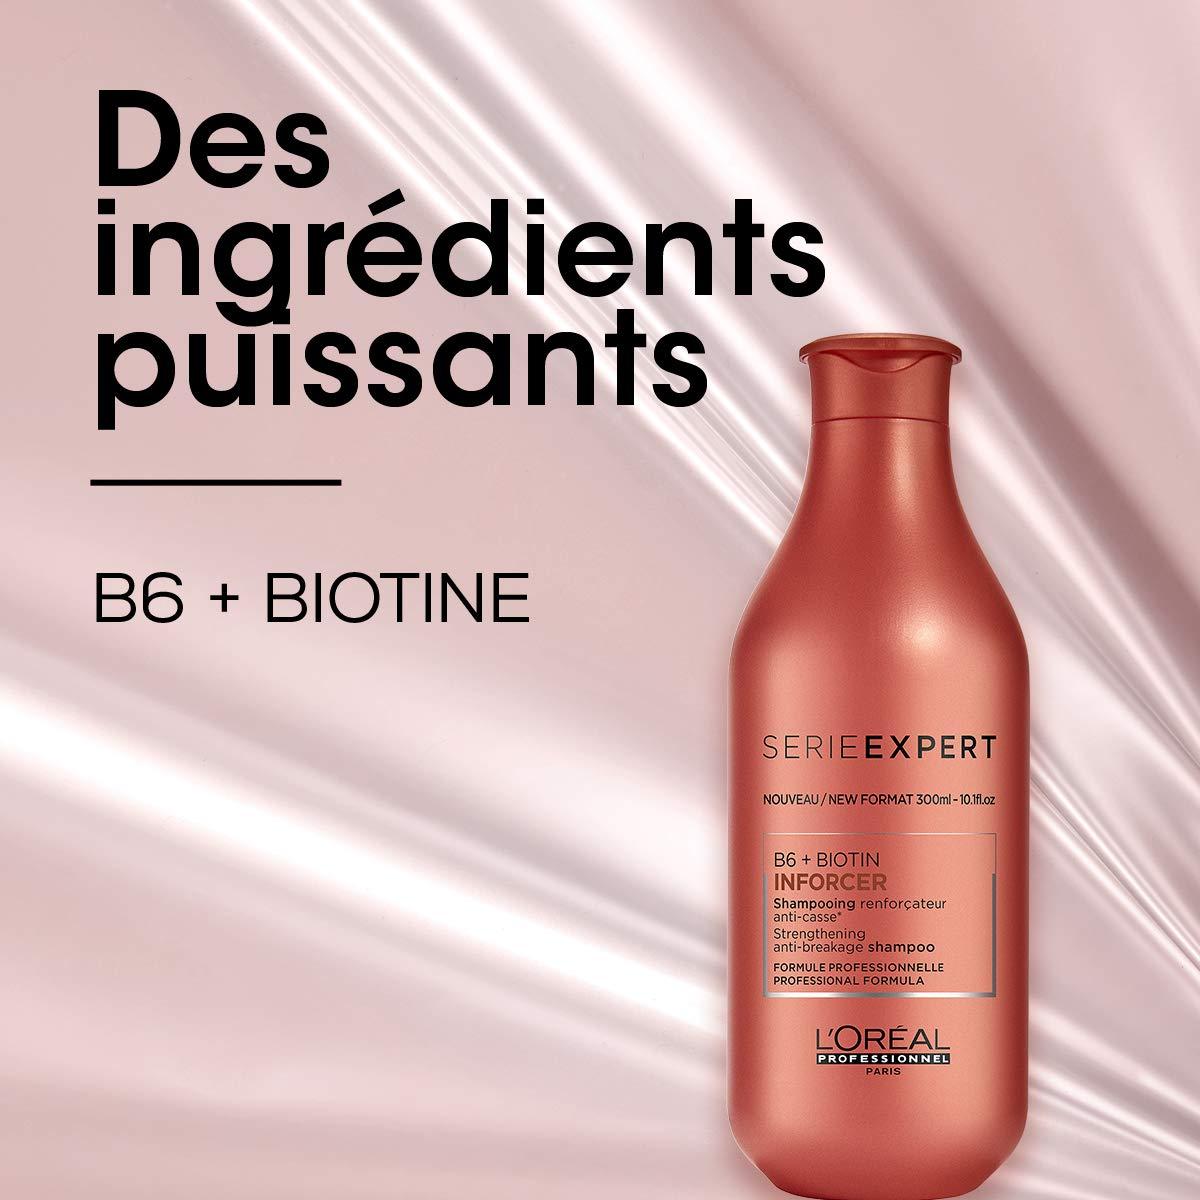 Travel Set Shampoo 18 ml + Masque 18 ml + Mythic Oil Crème ...